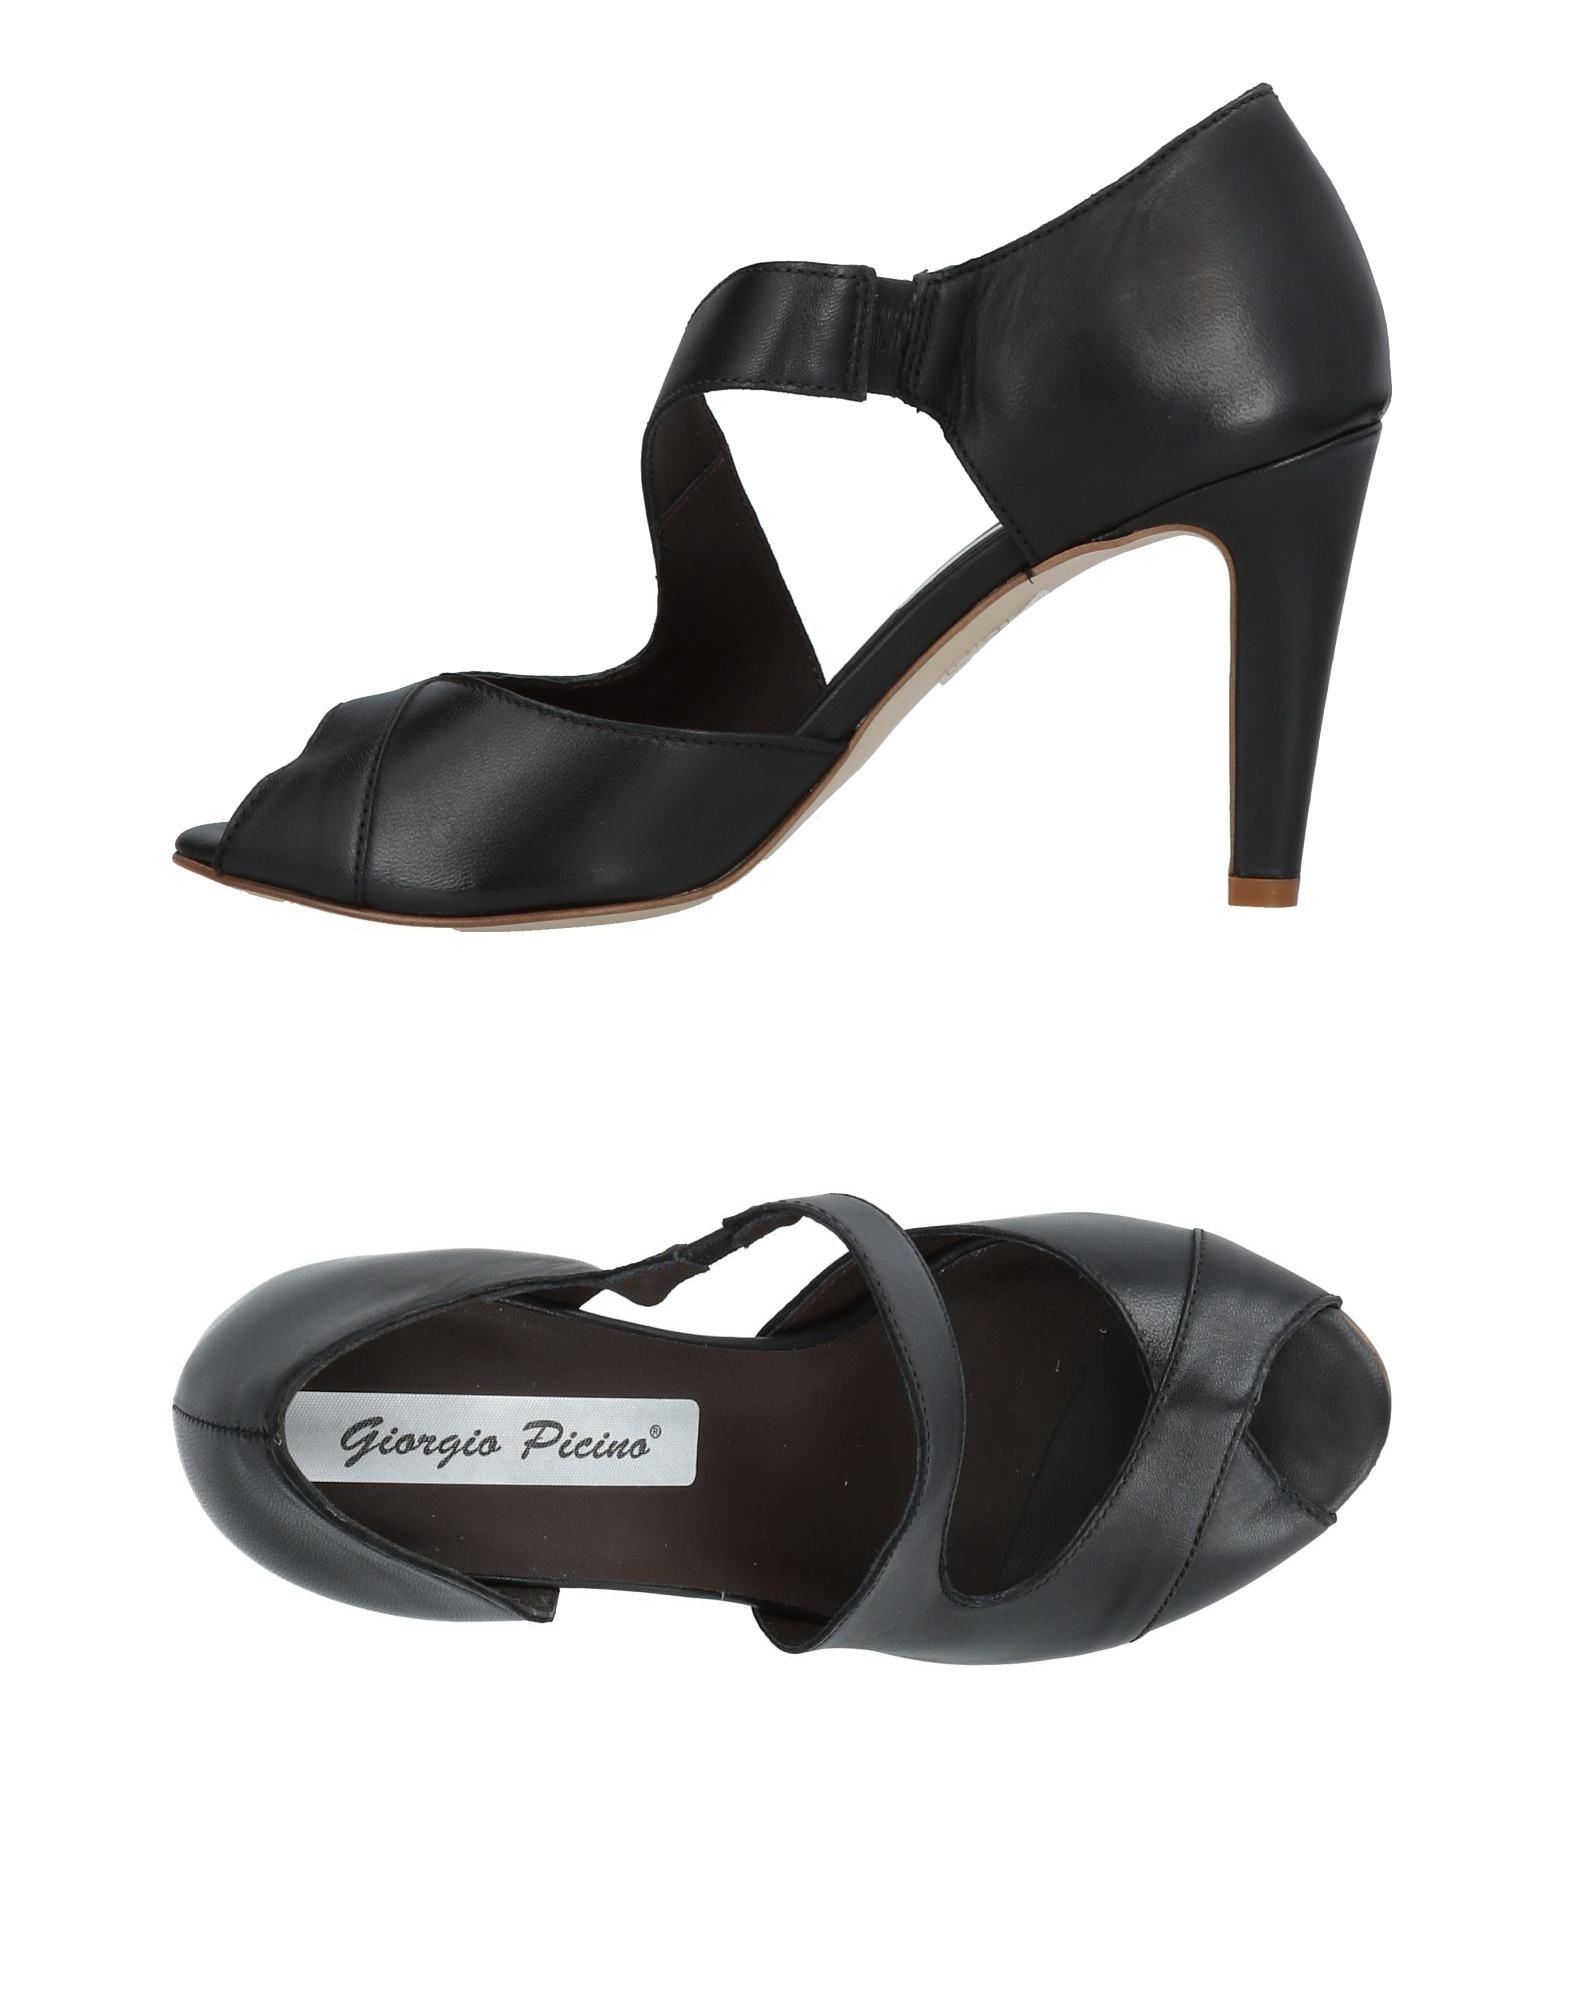 Giorgio Picino Pumps Damen  11427619RX Gute Qualität beliebte Schuhe